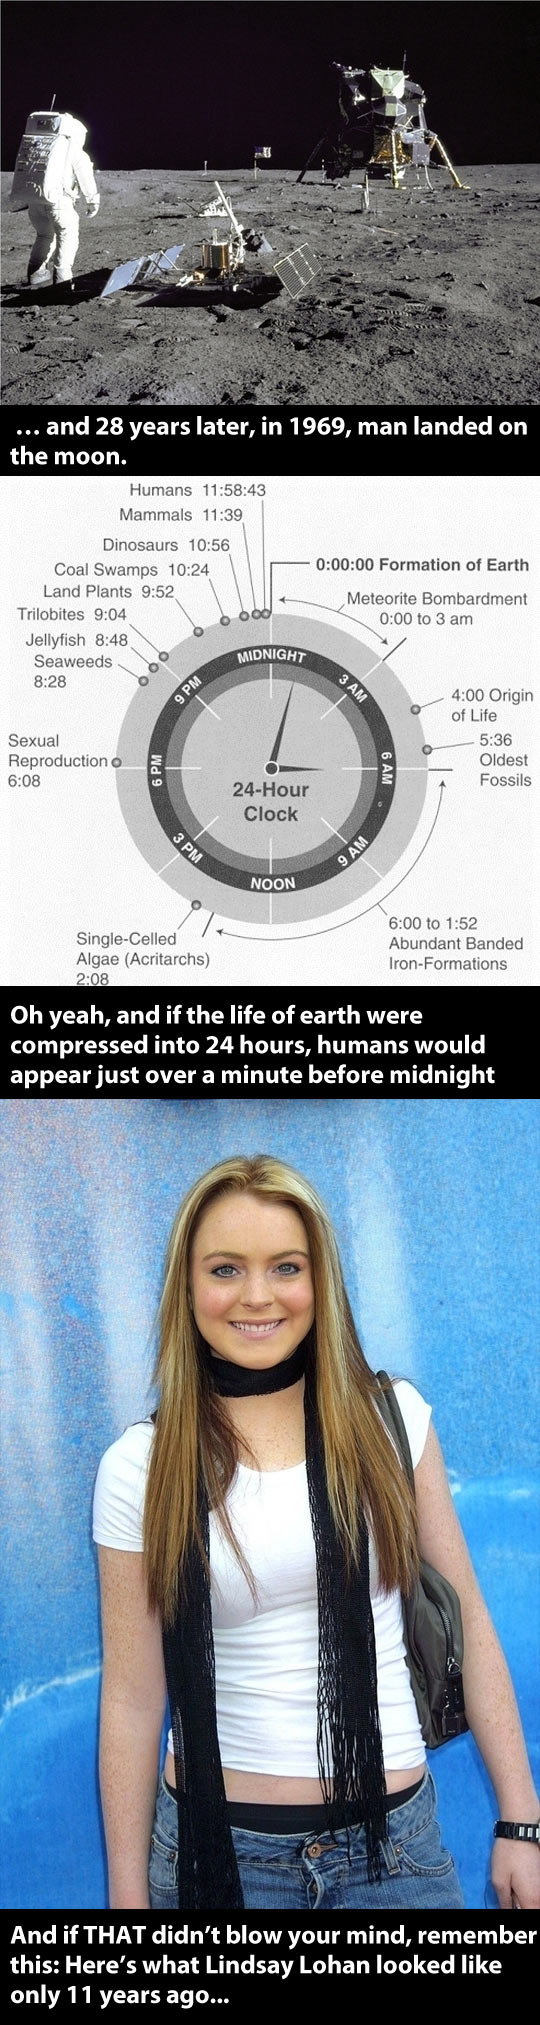 cool-facts-moon-man-Lindsay-Lohan